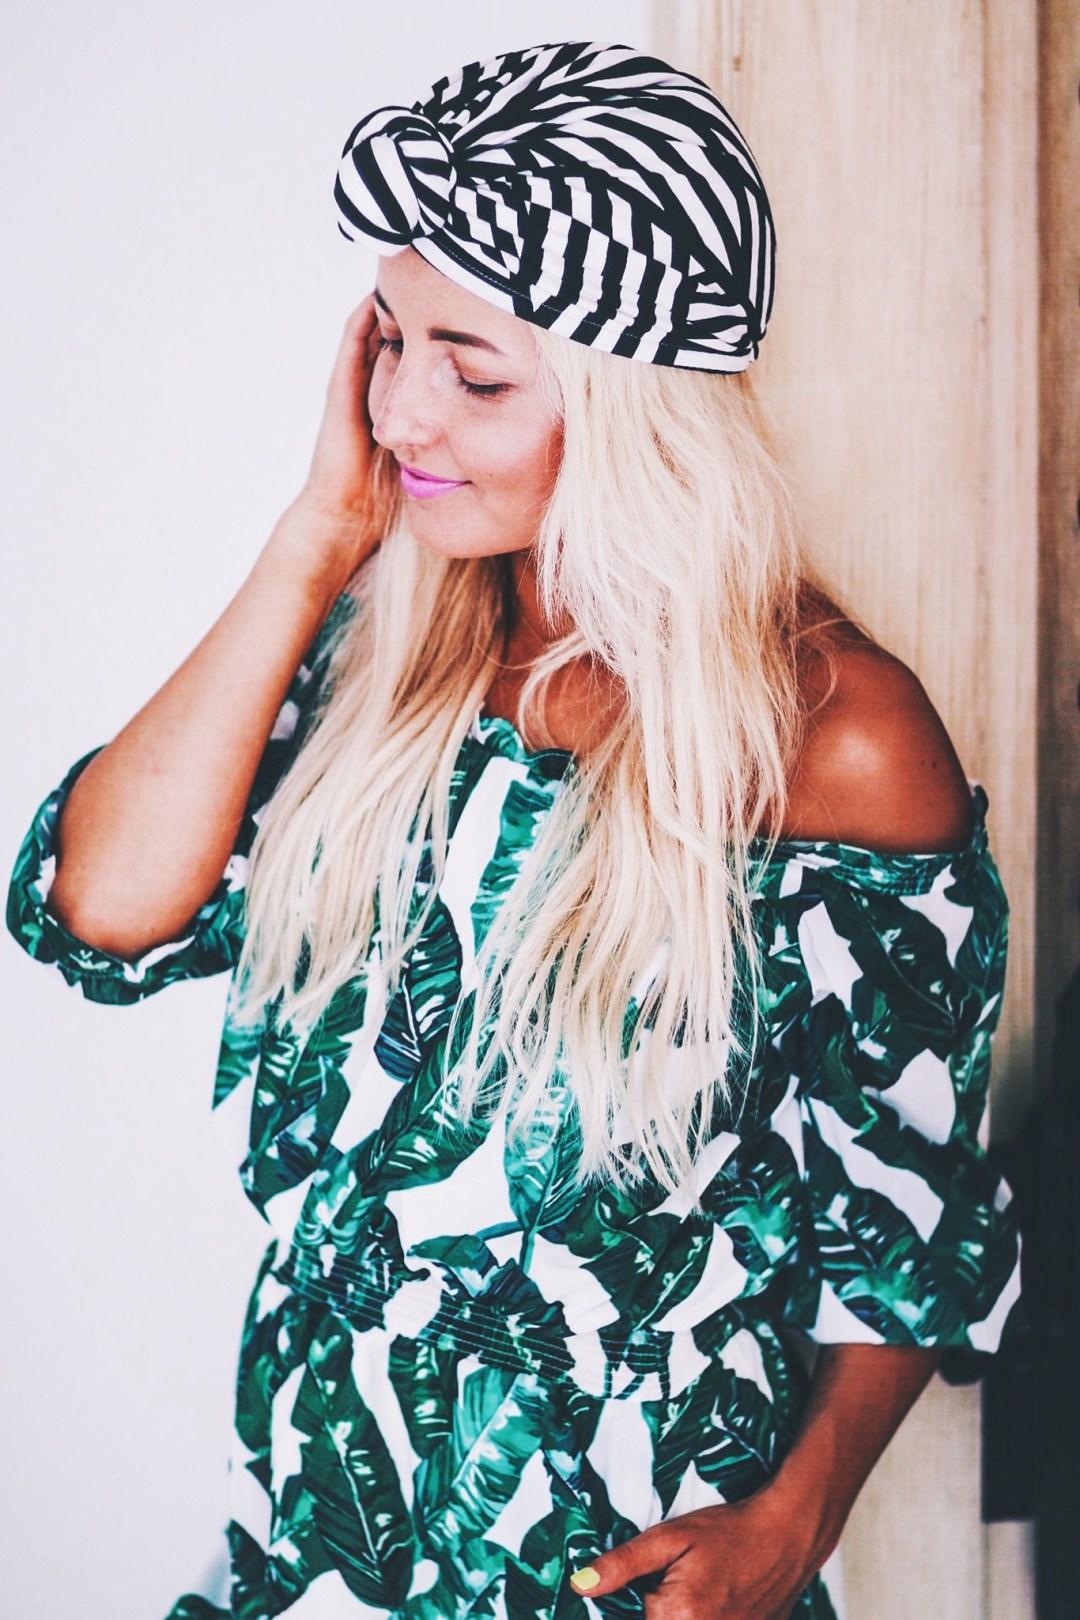 Alena Gidenko of modaprints.com styles a palm print romper for the beach